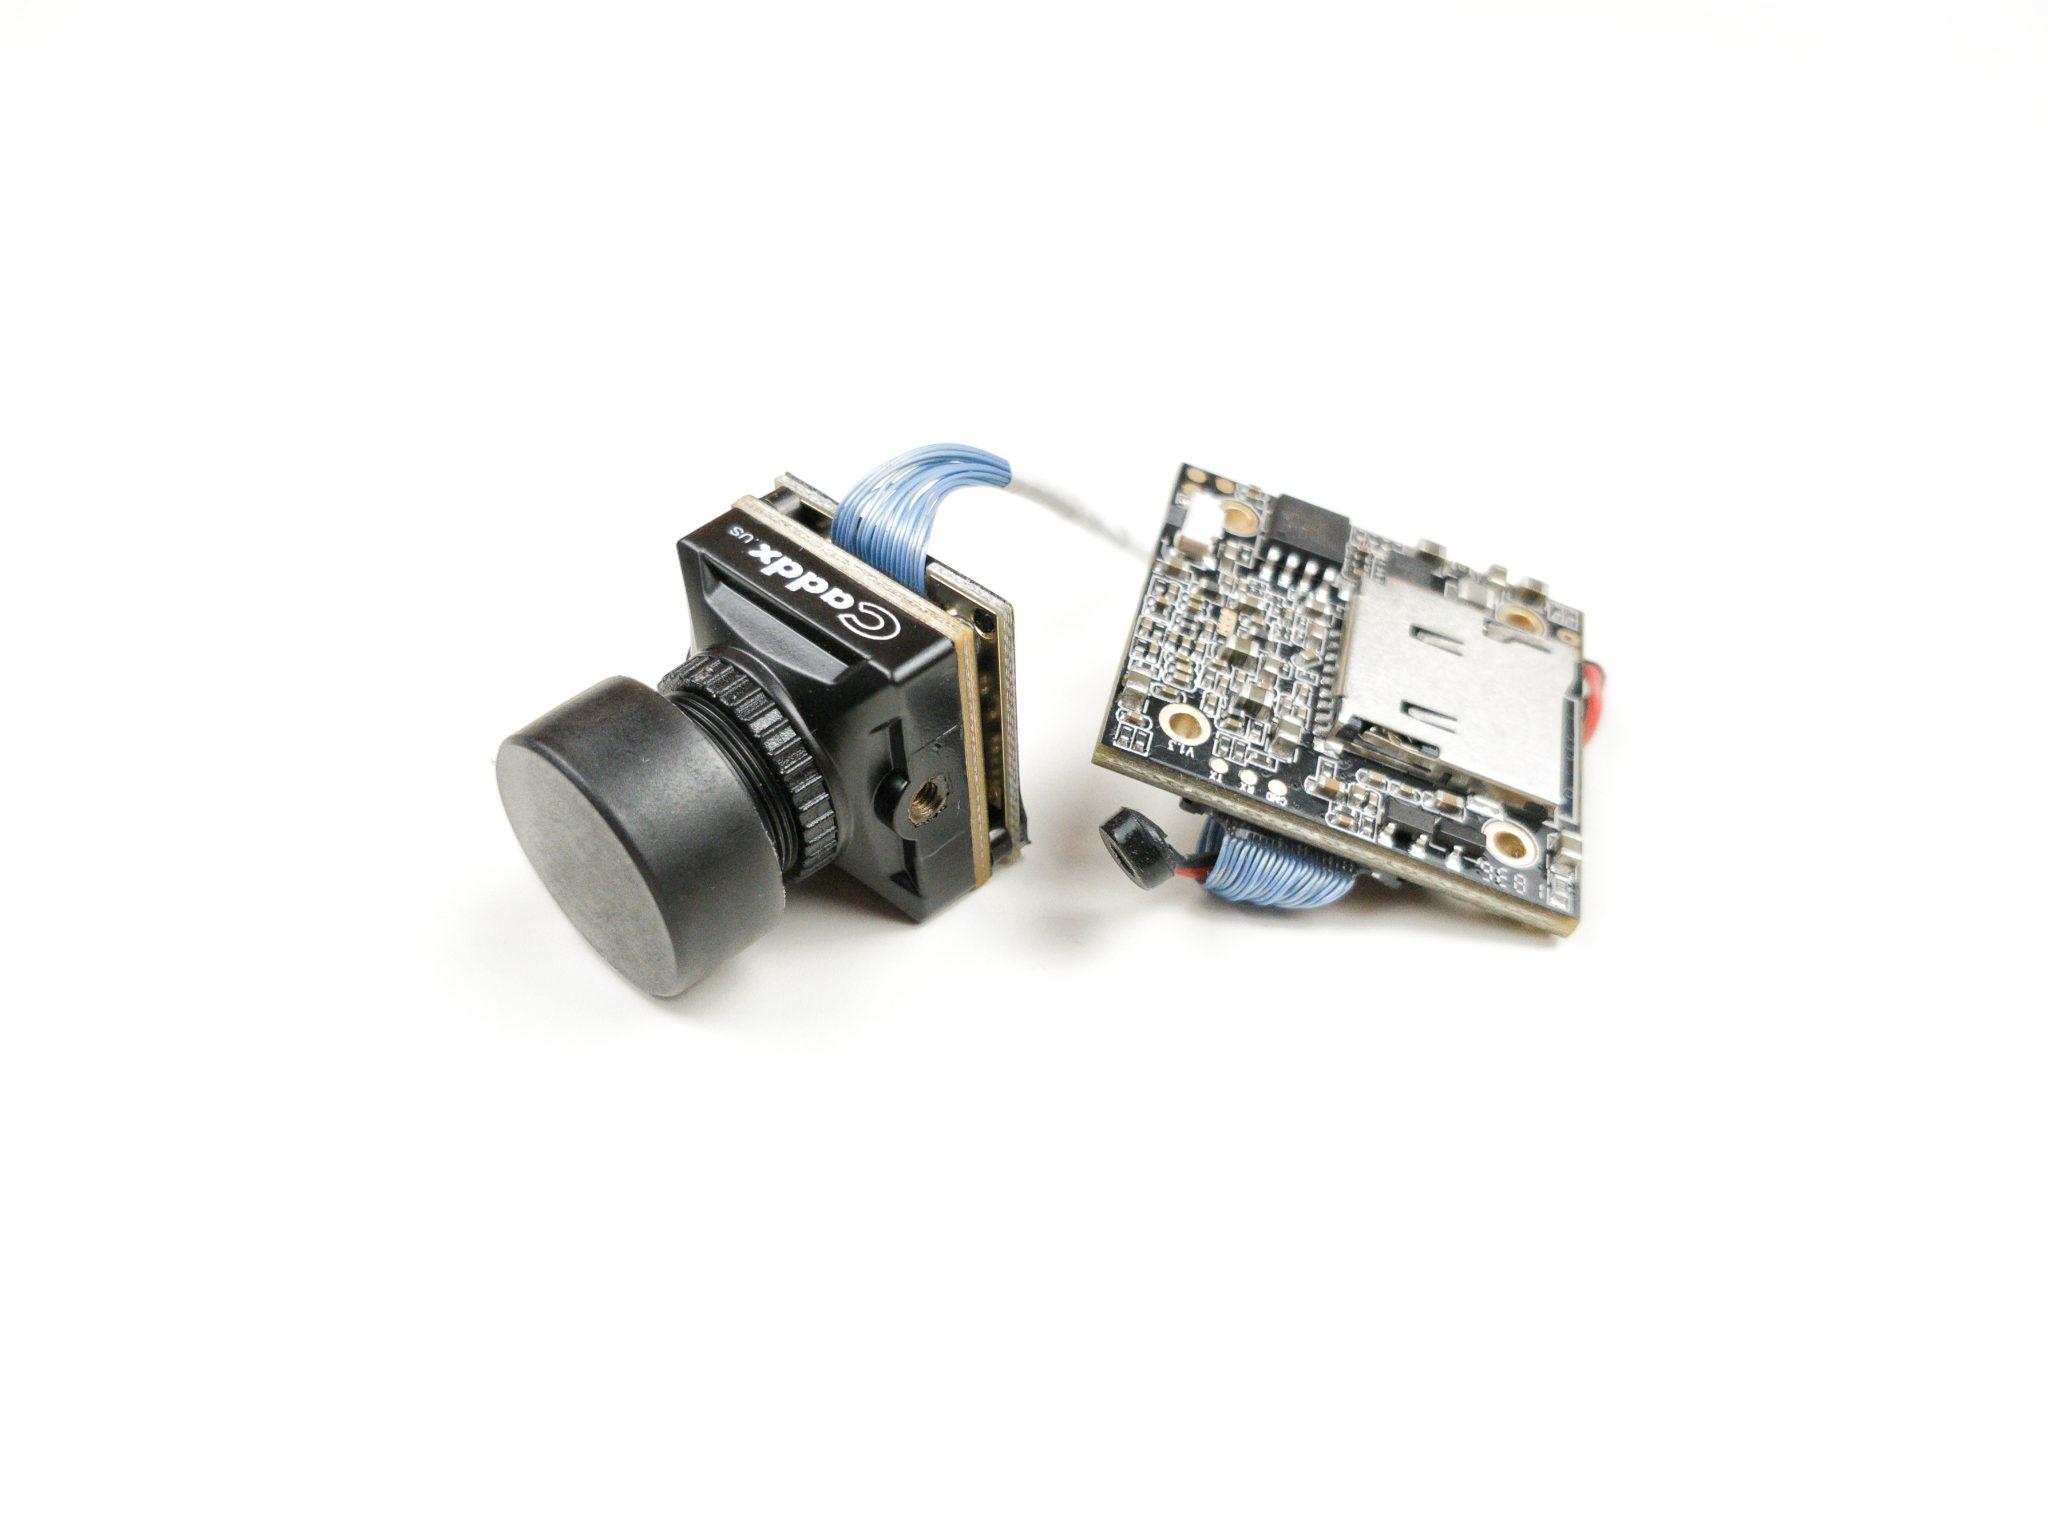 Caddx Turtle V2 1080p 60fps Mini HD FPV Camera w/DVR - Black